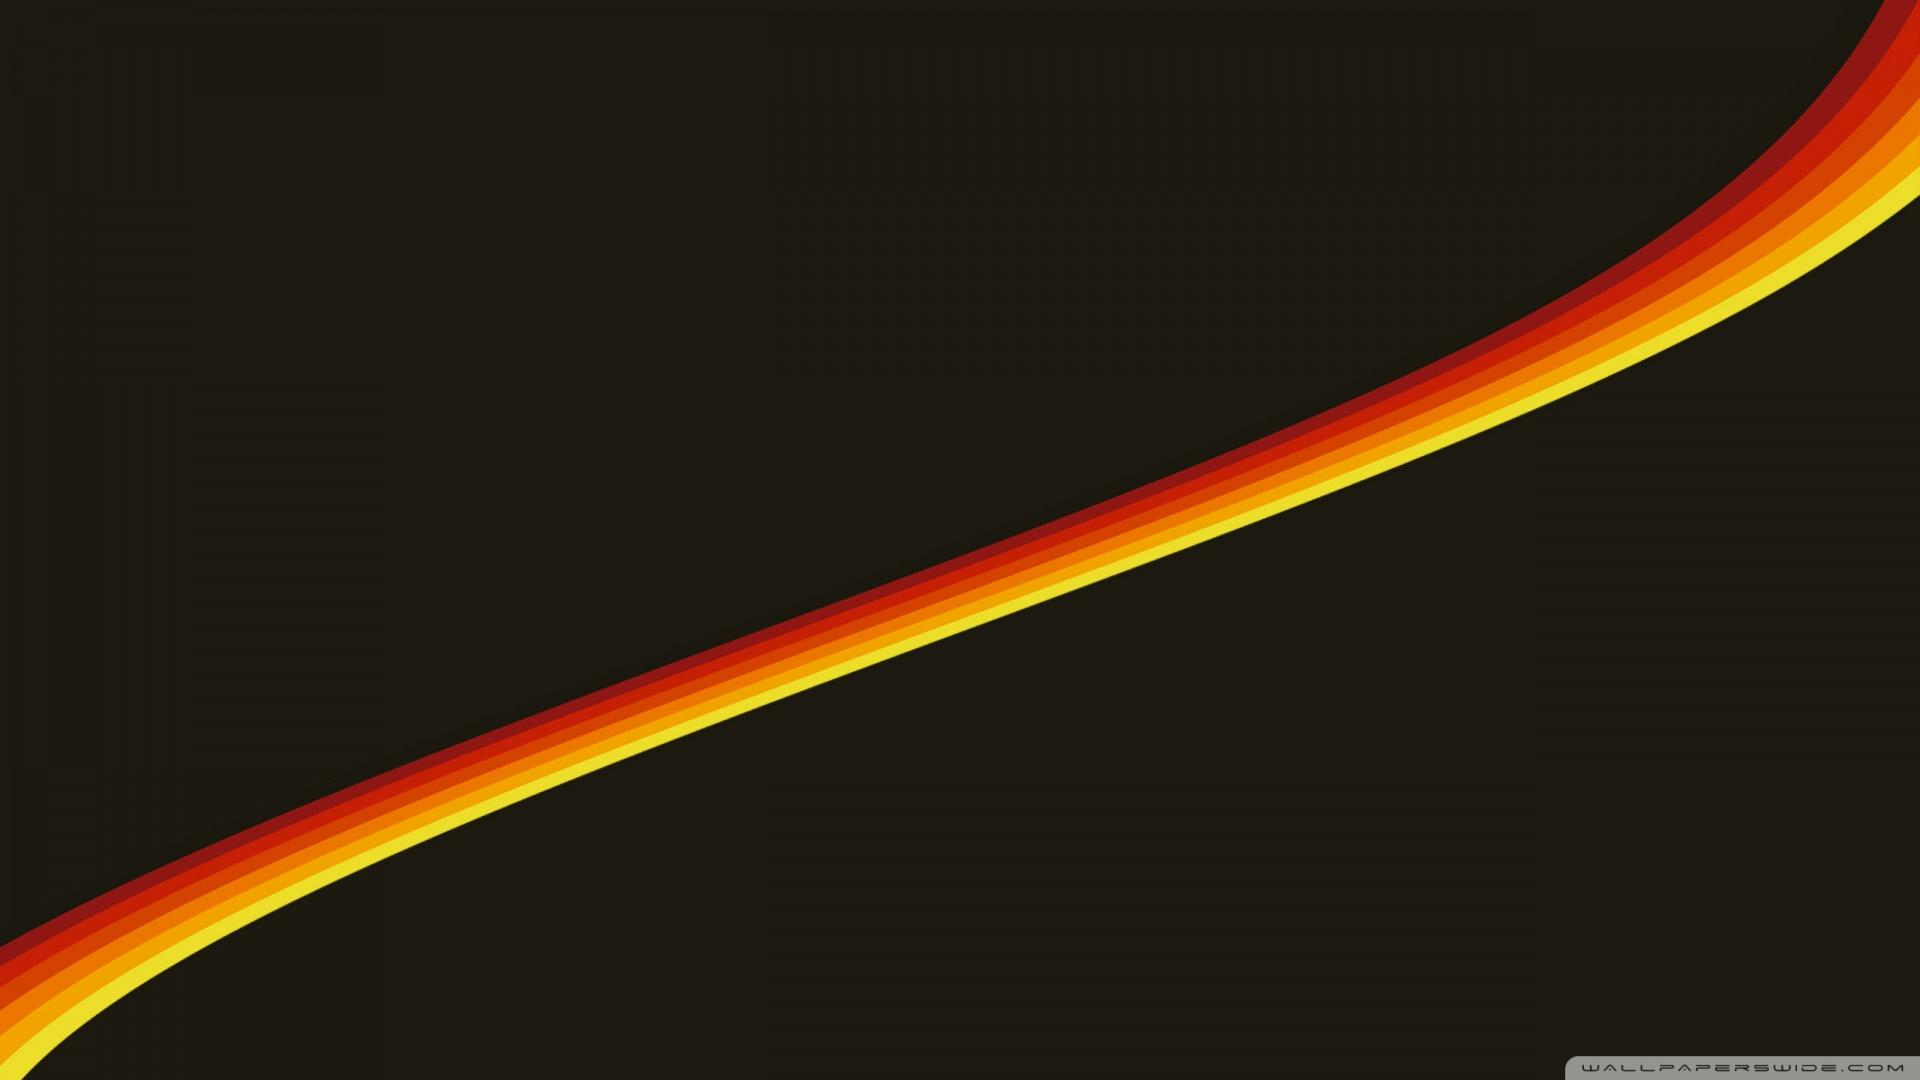 download free orange black and red line wallpaper ppt backgrounds